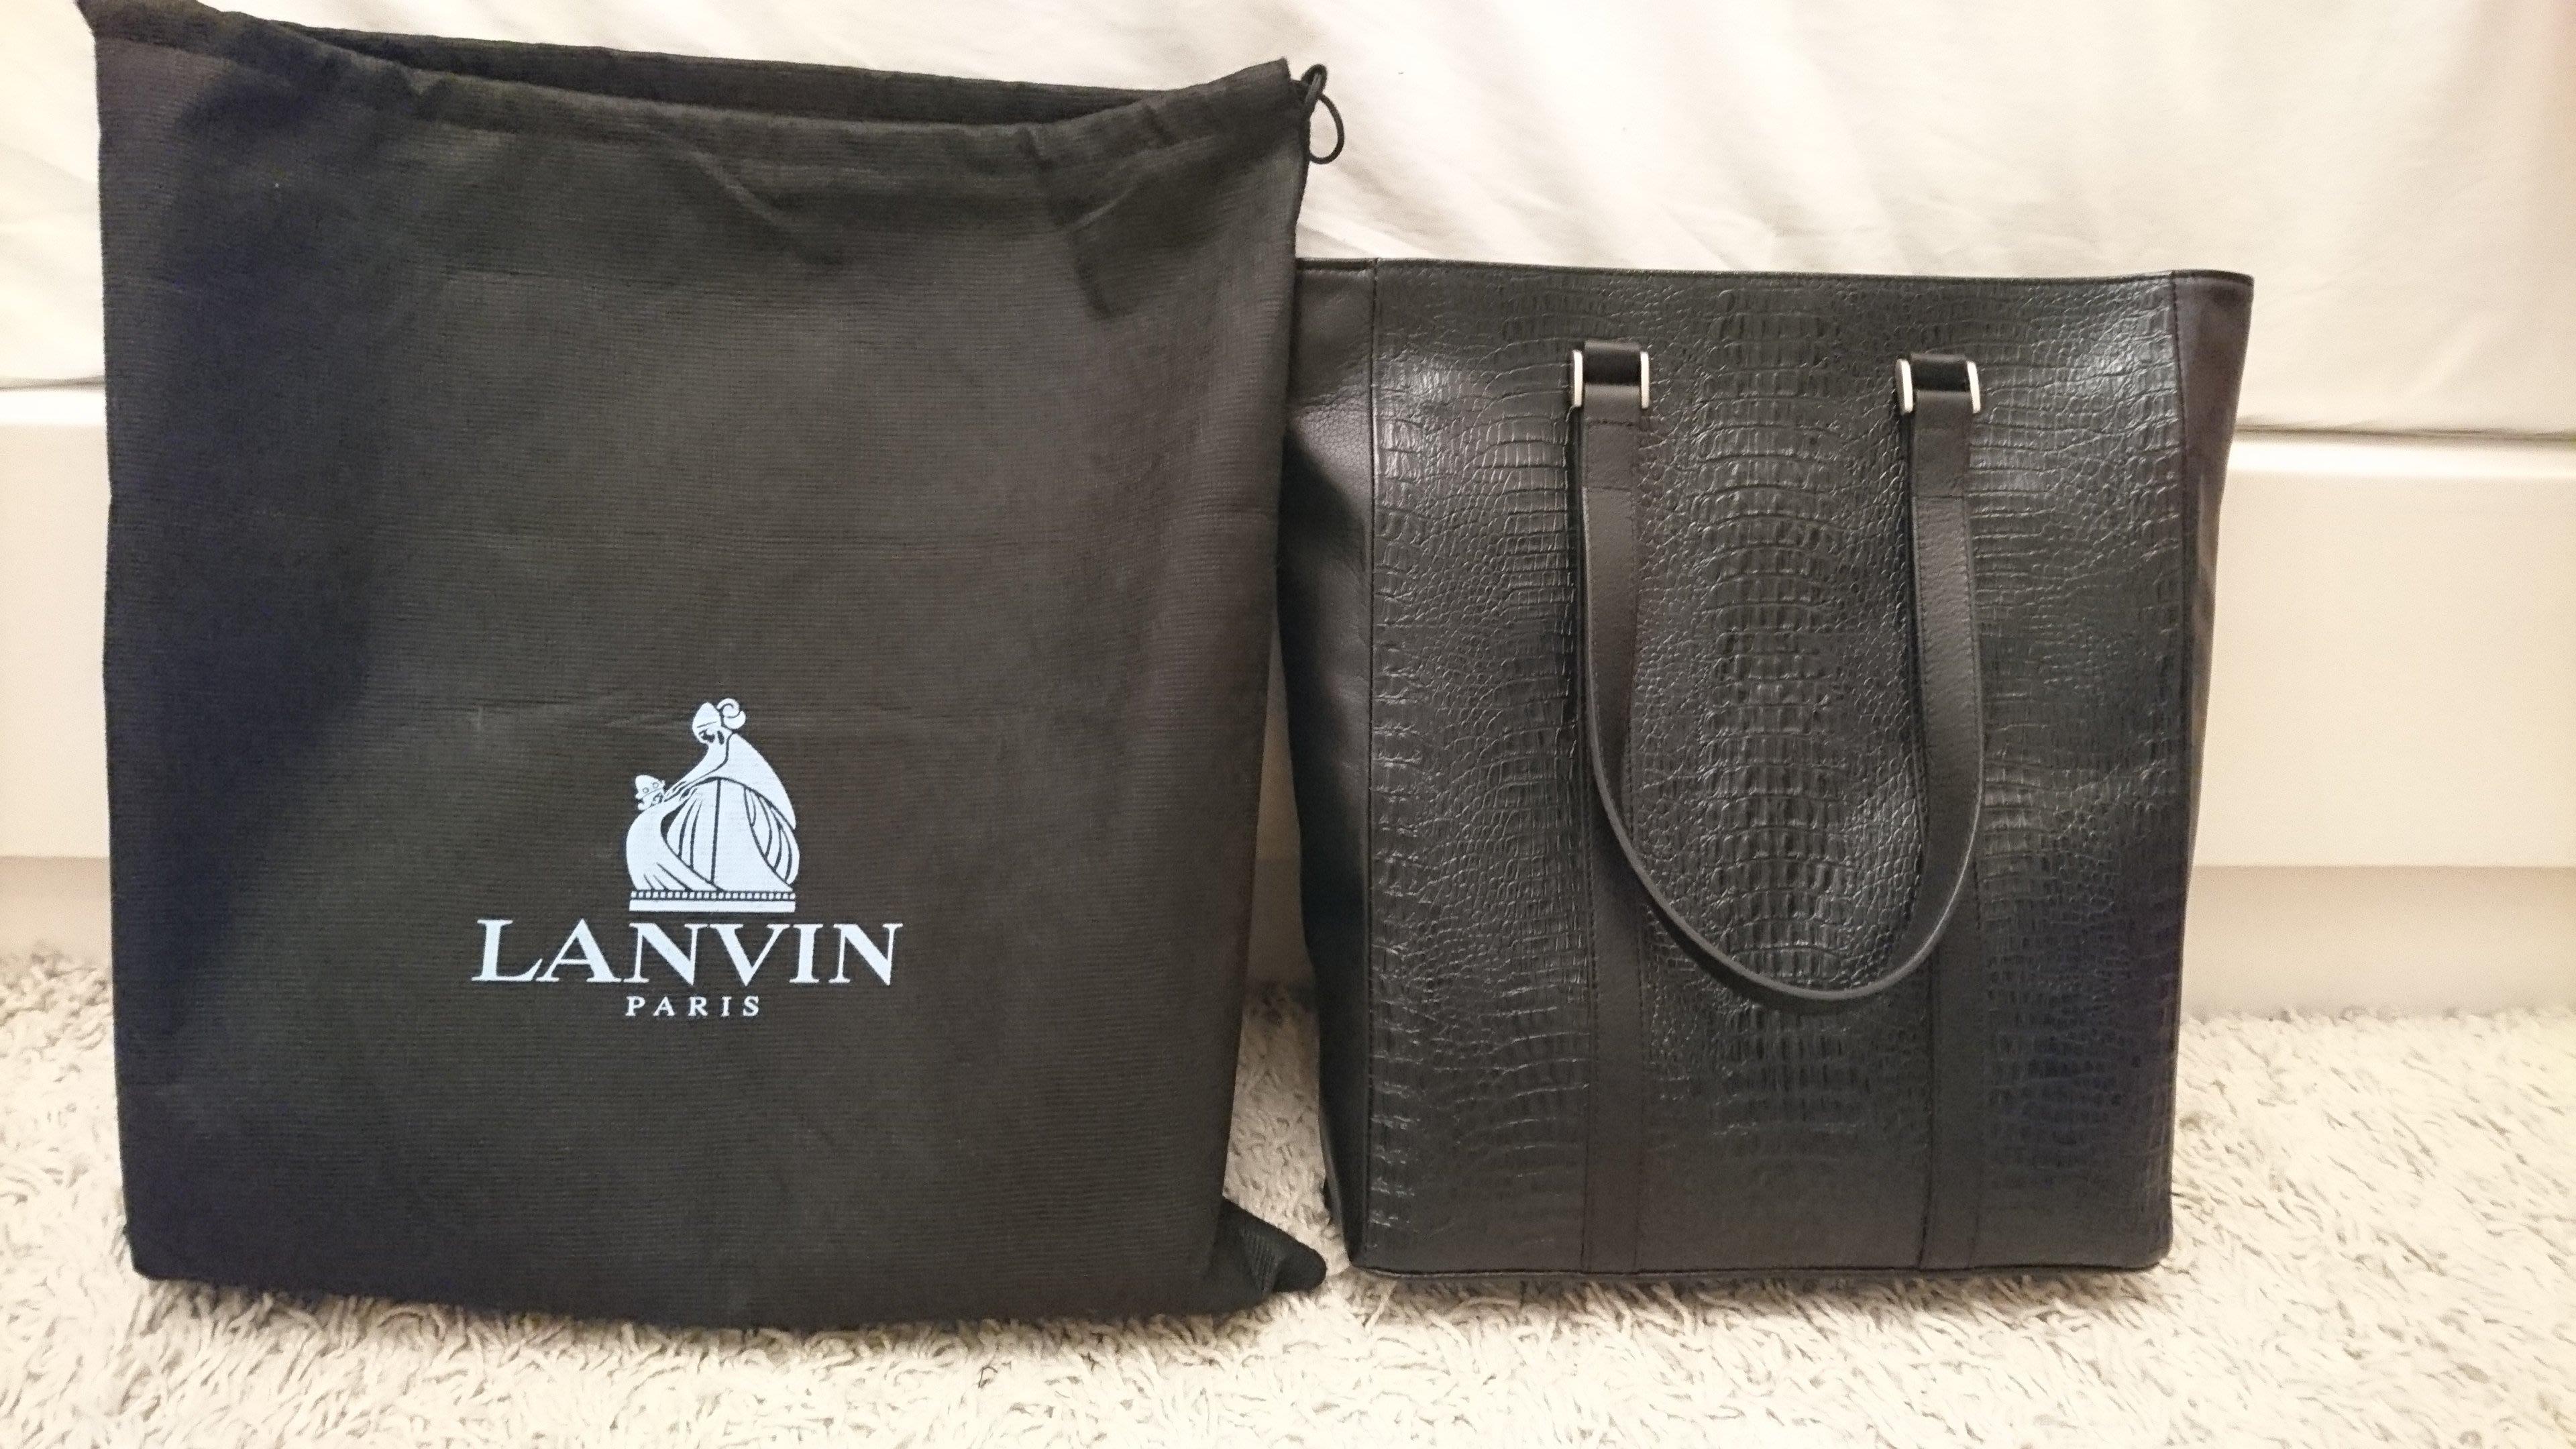 Lanvin 黑色全牛皮押鱷魚紋托特包